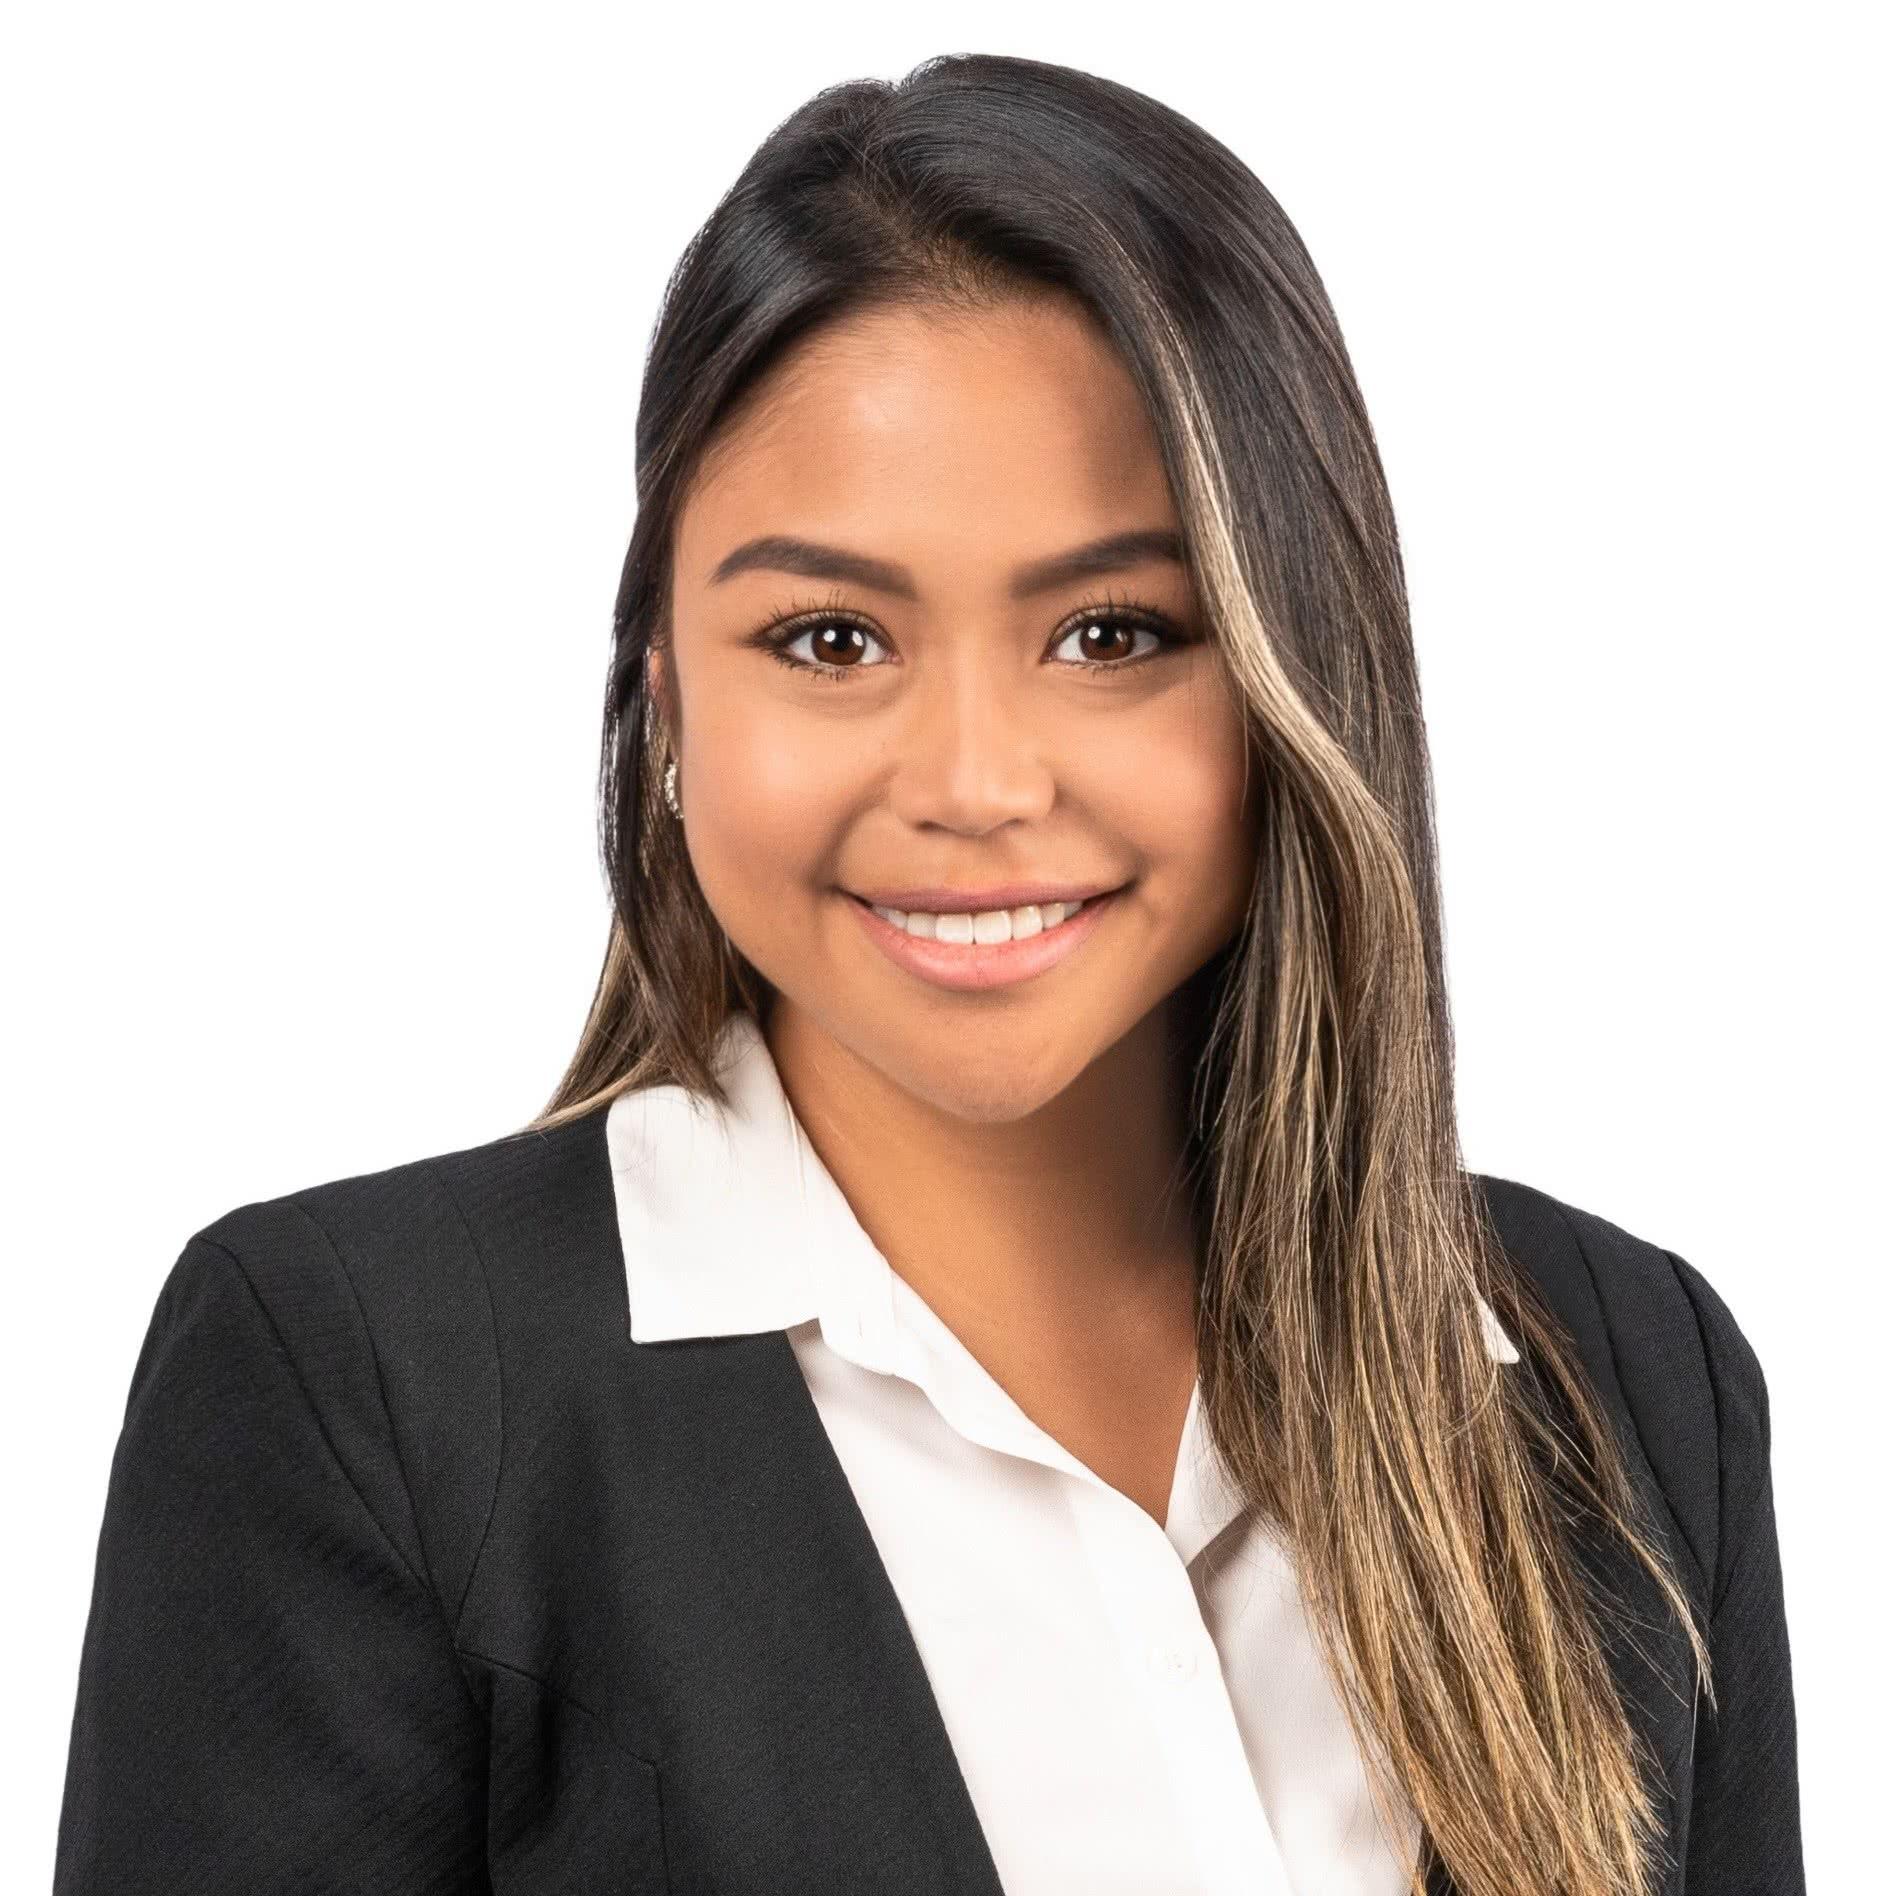 Christelle-Hannah Manila